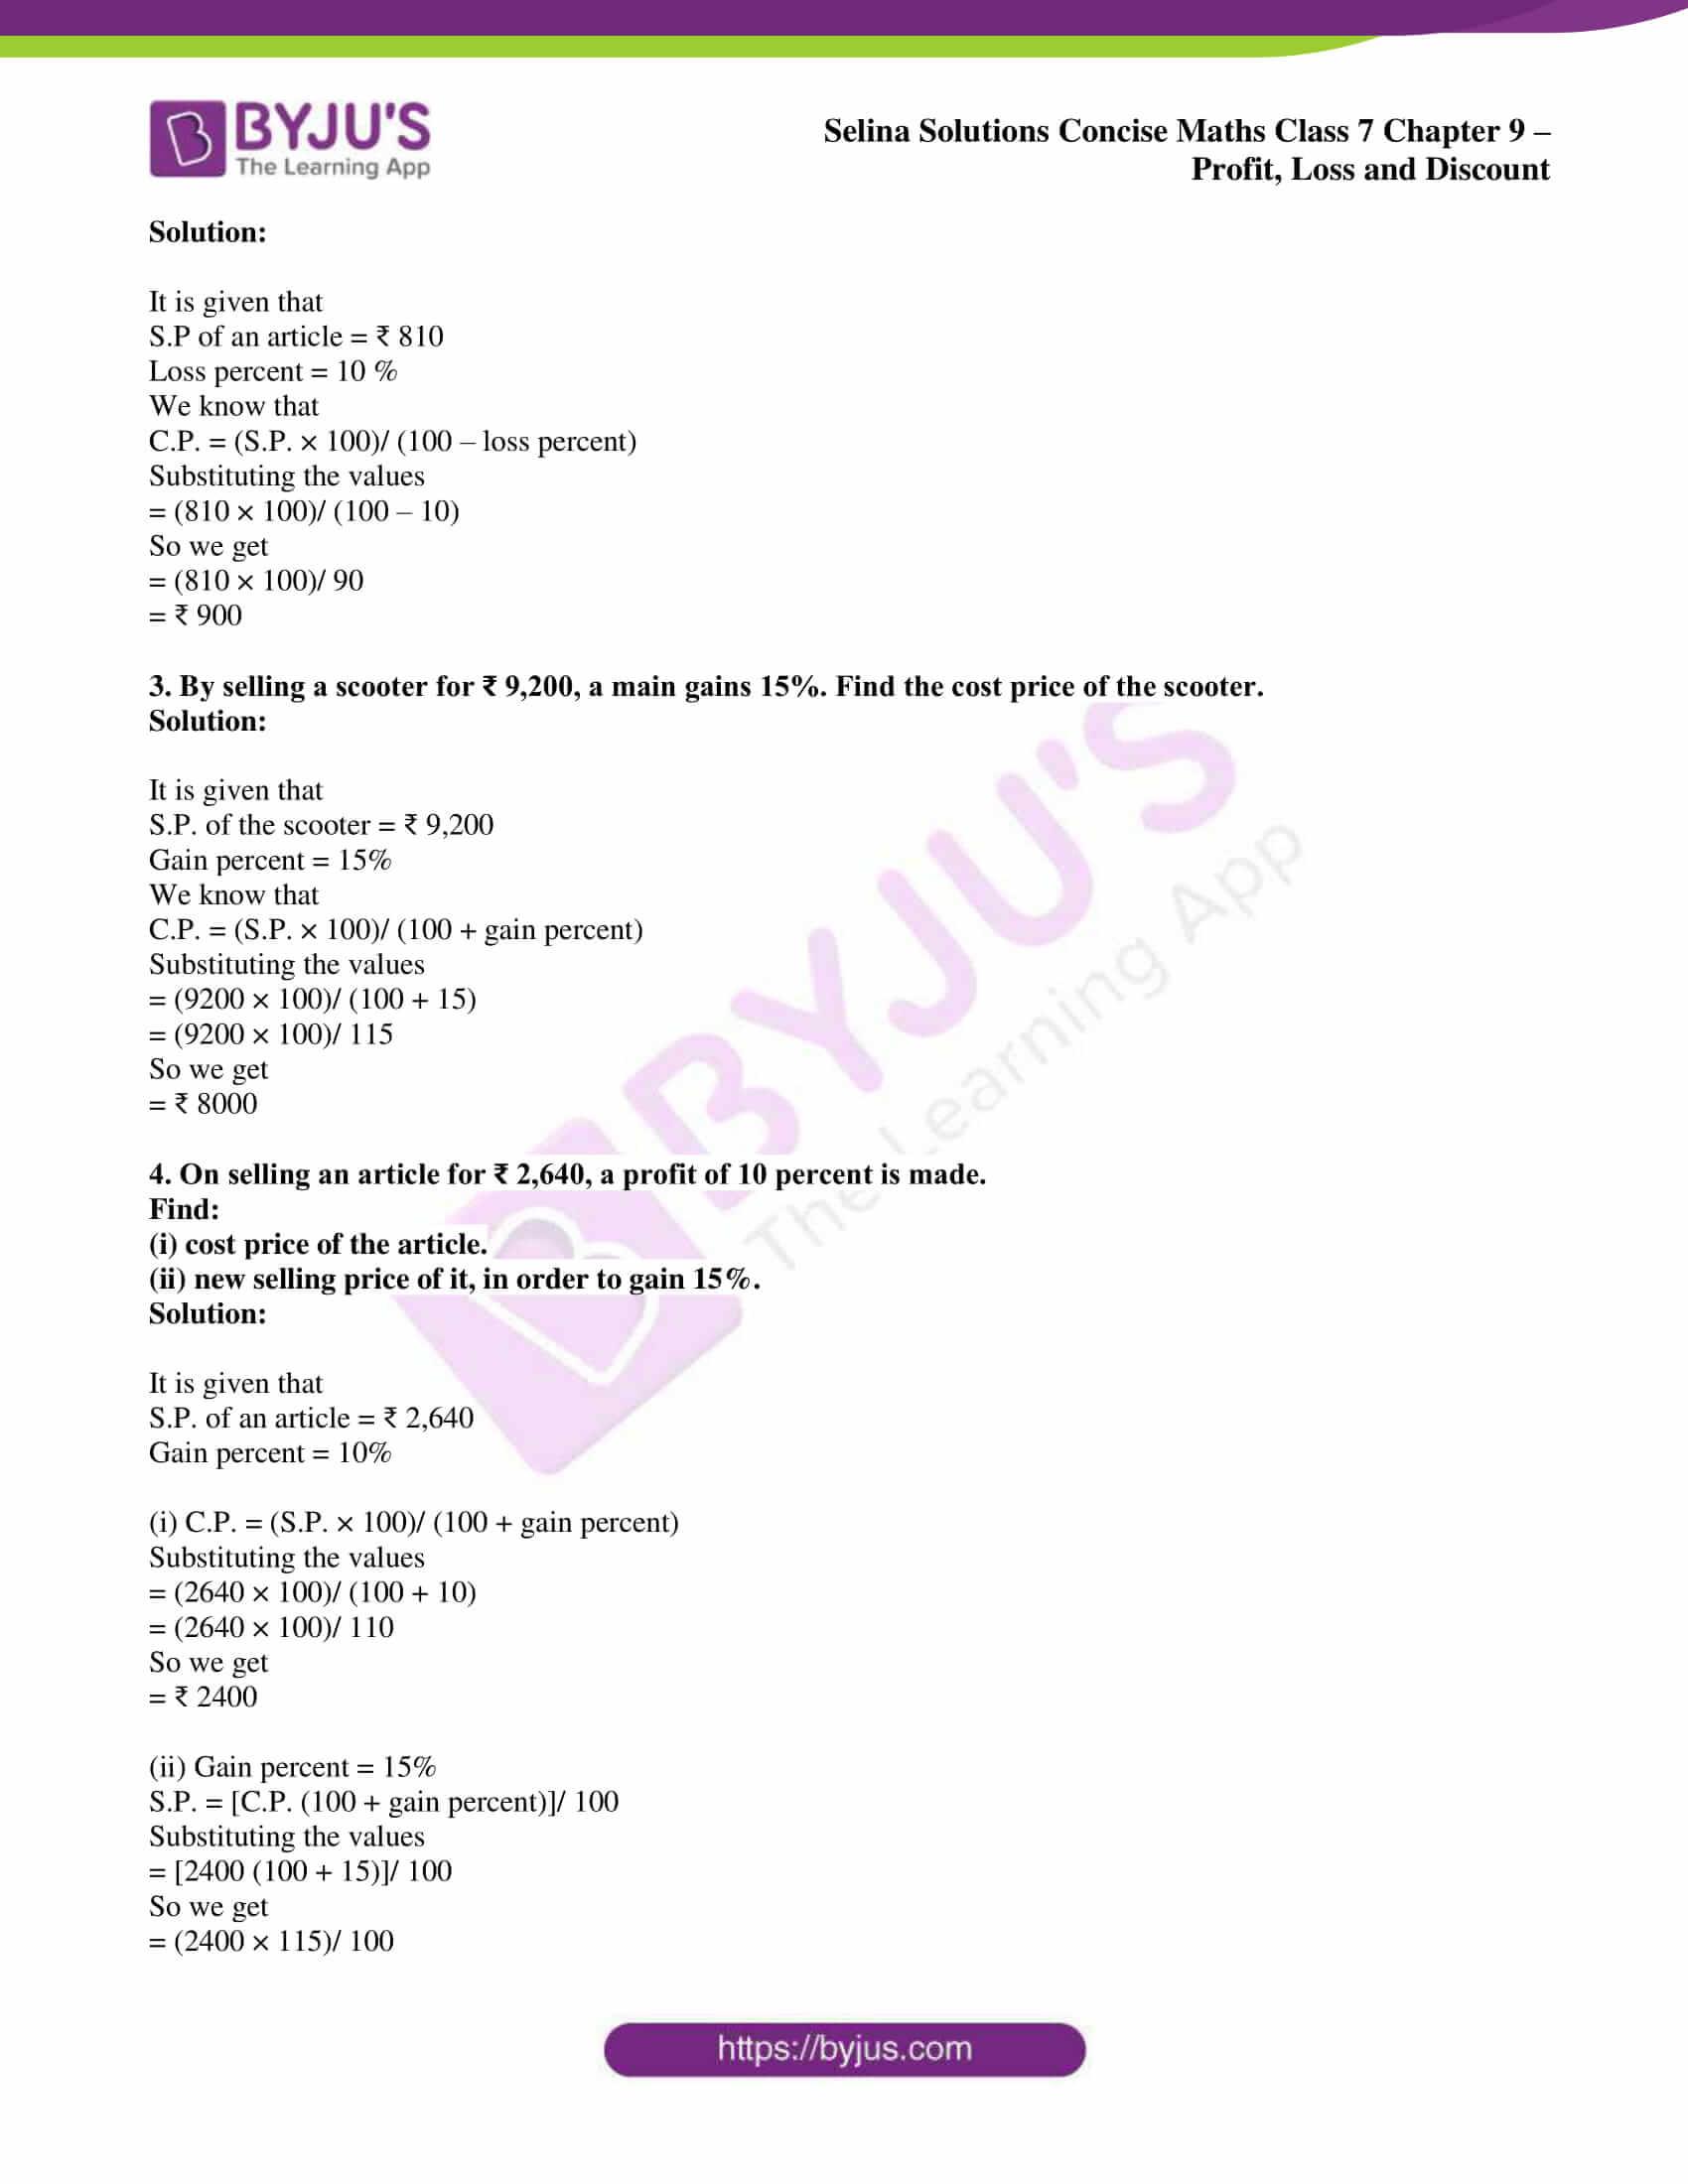 selina sol concise maths class 7 ch9 ex 9b 2